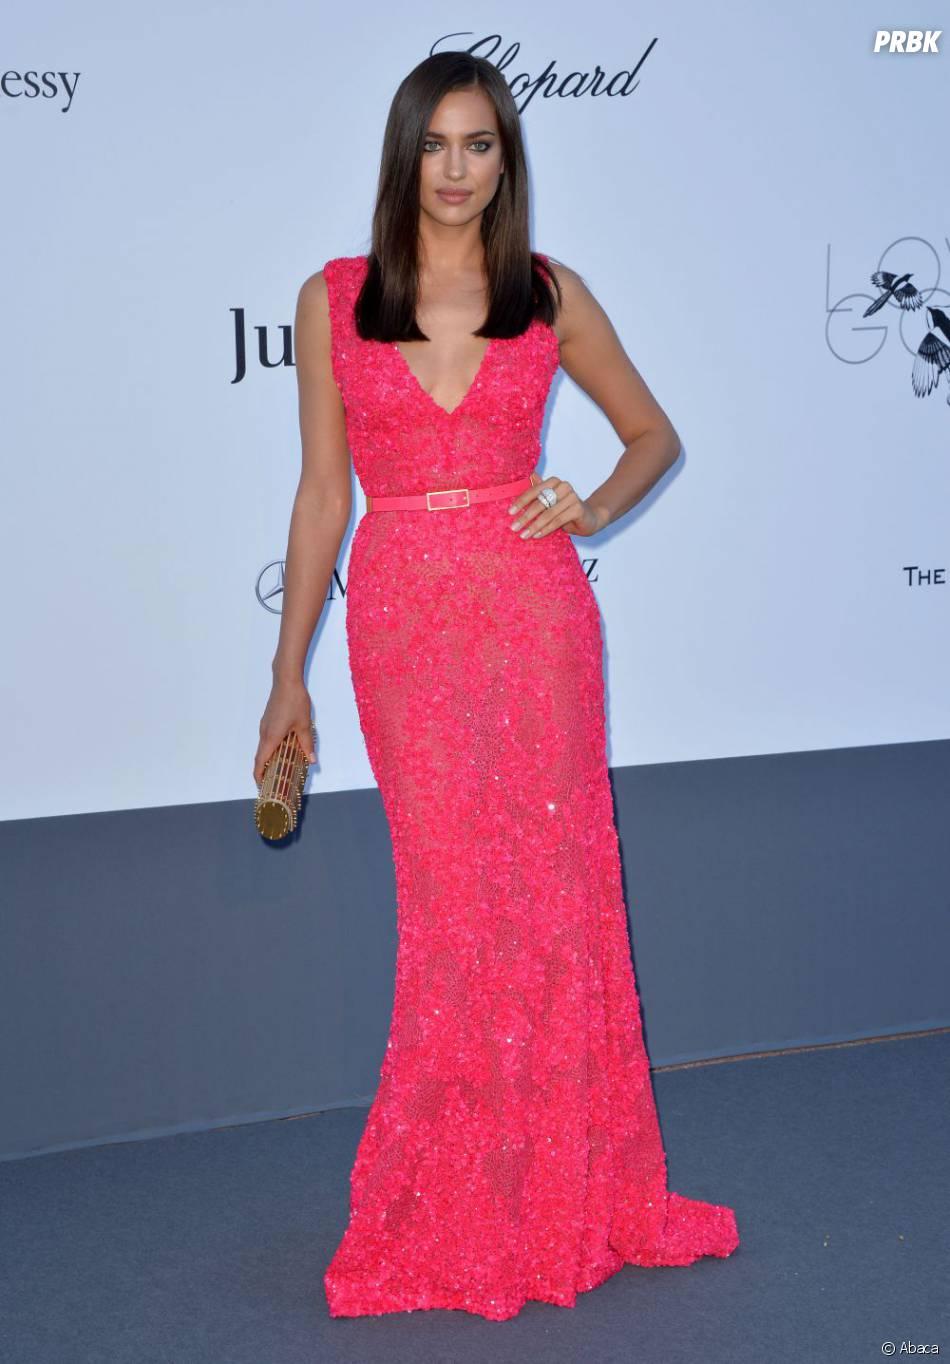 Irina Shayk à la soirée amfAR du festival de Cannes 2013